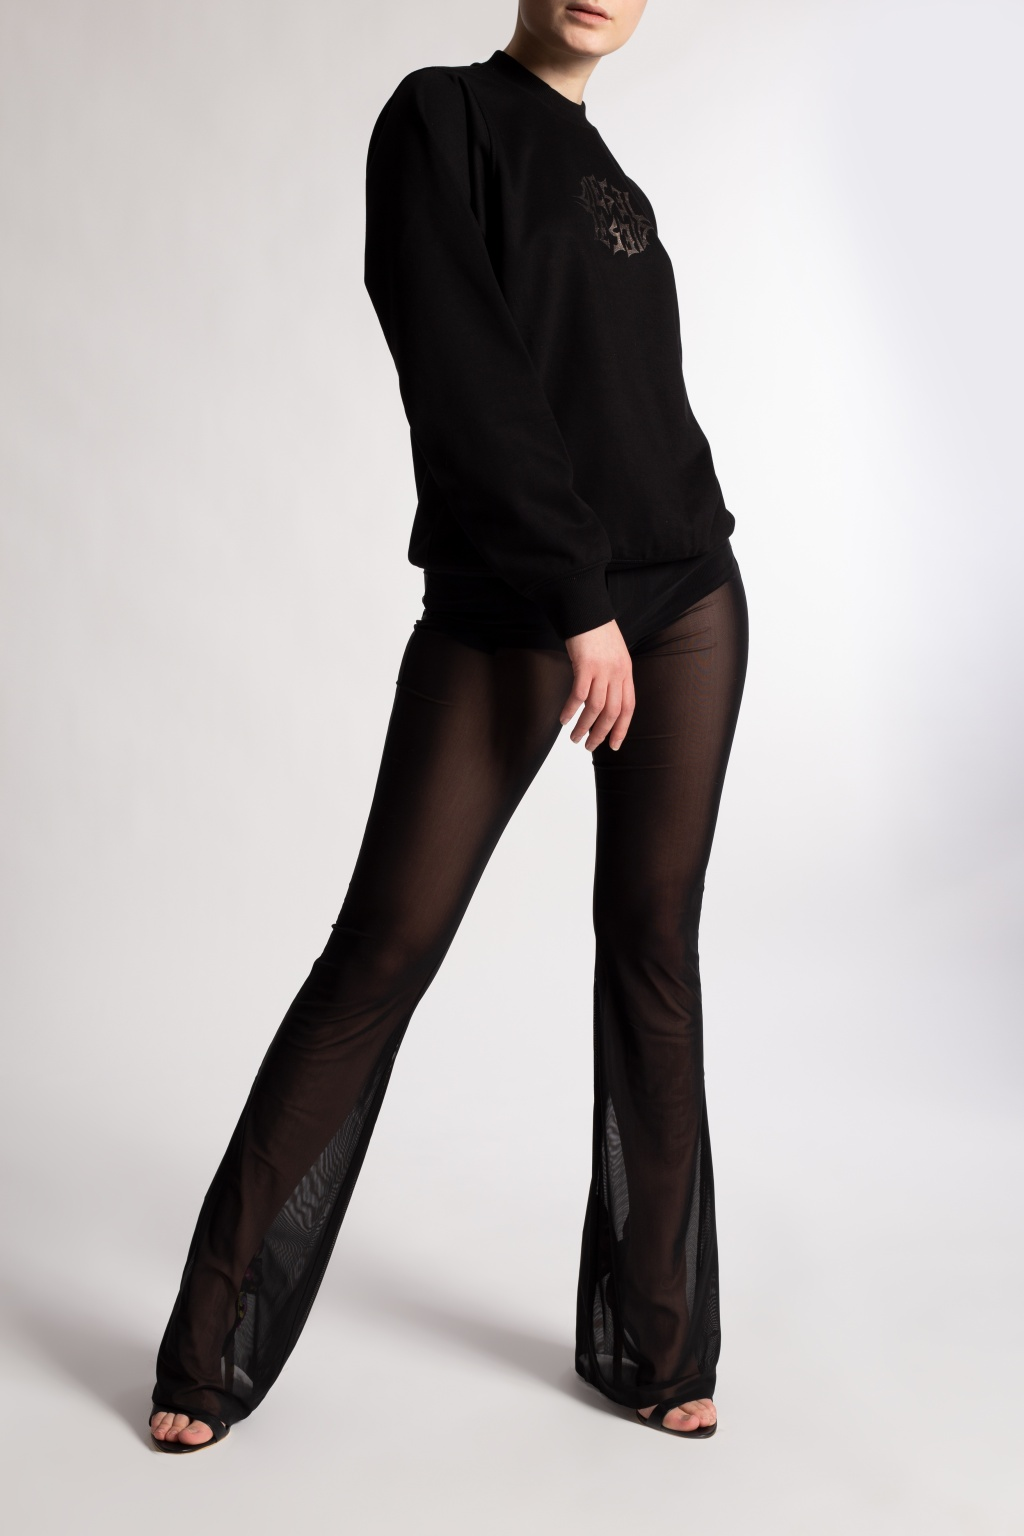 Sophia Webster 'Chiara' stiletto sandals